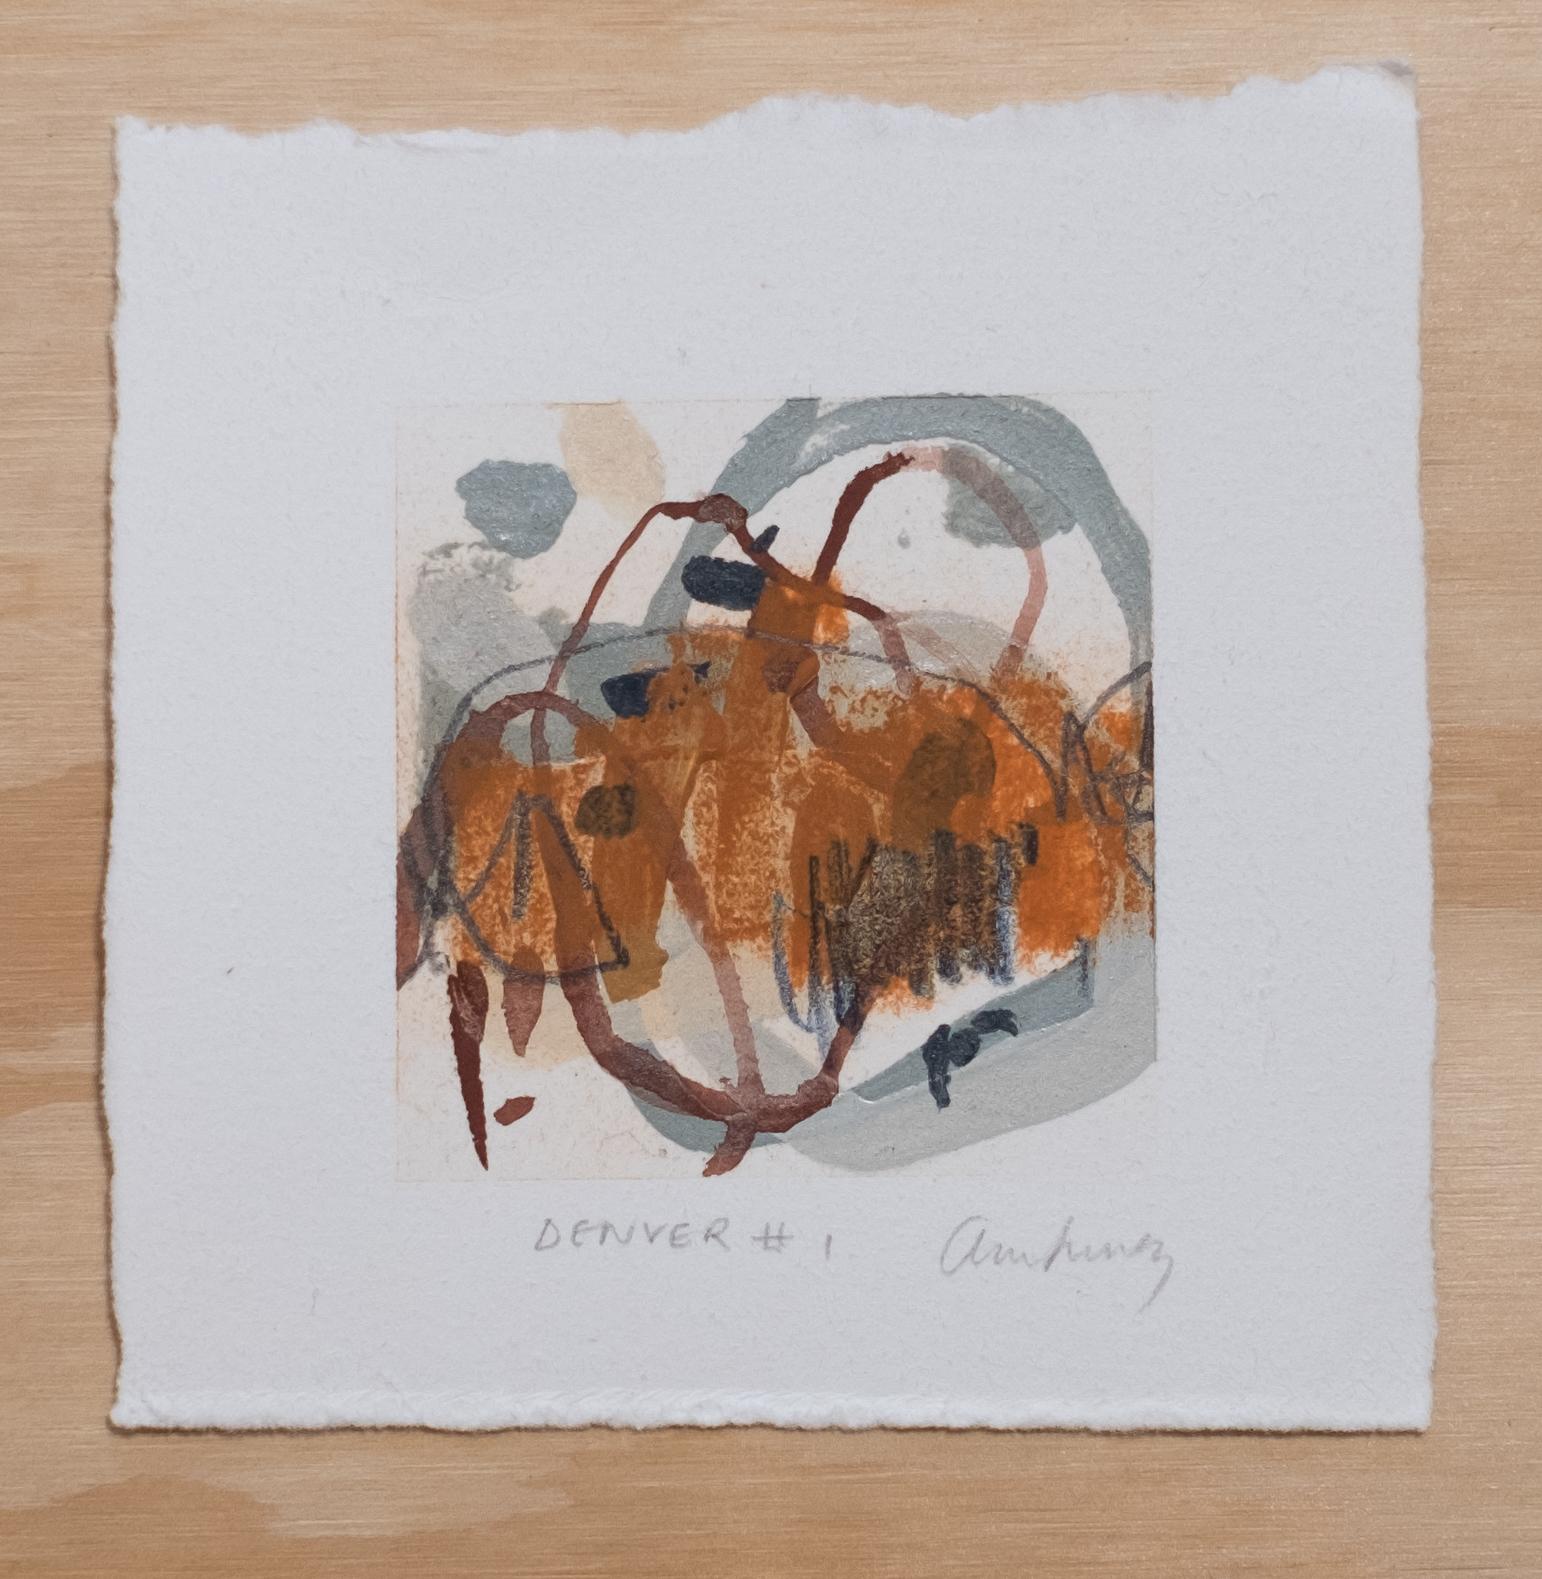 "Denver #1 / 4.5"" x 4.5"" / watercolor, acrylic paint and chalk pastel on cotton paper"